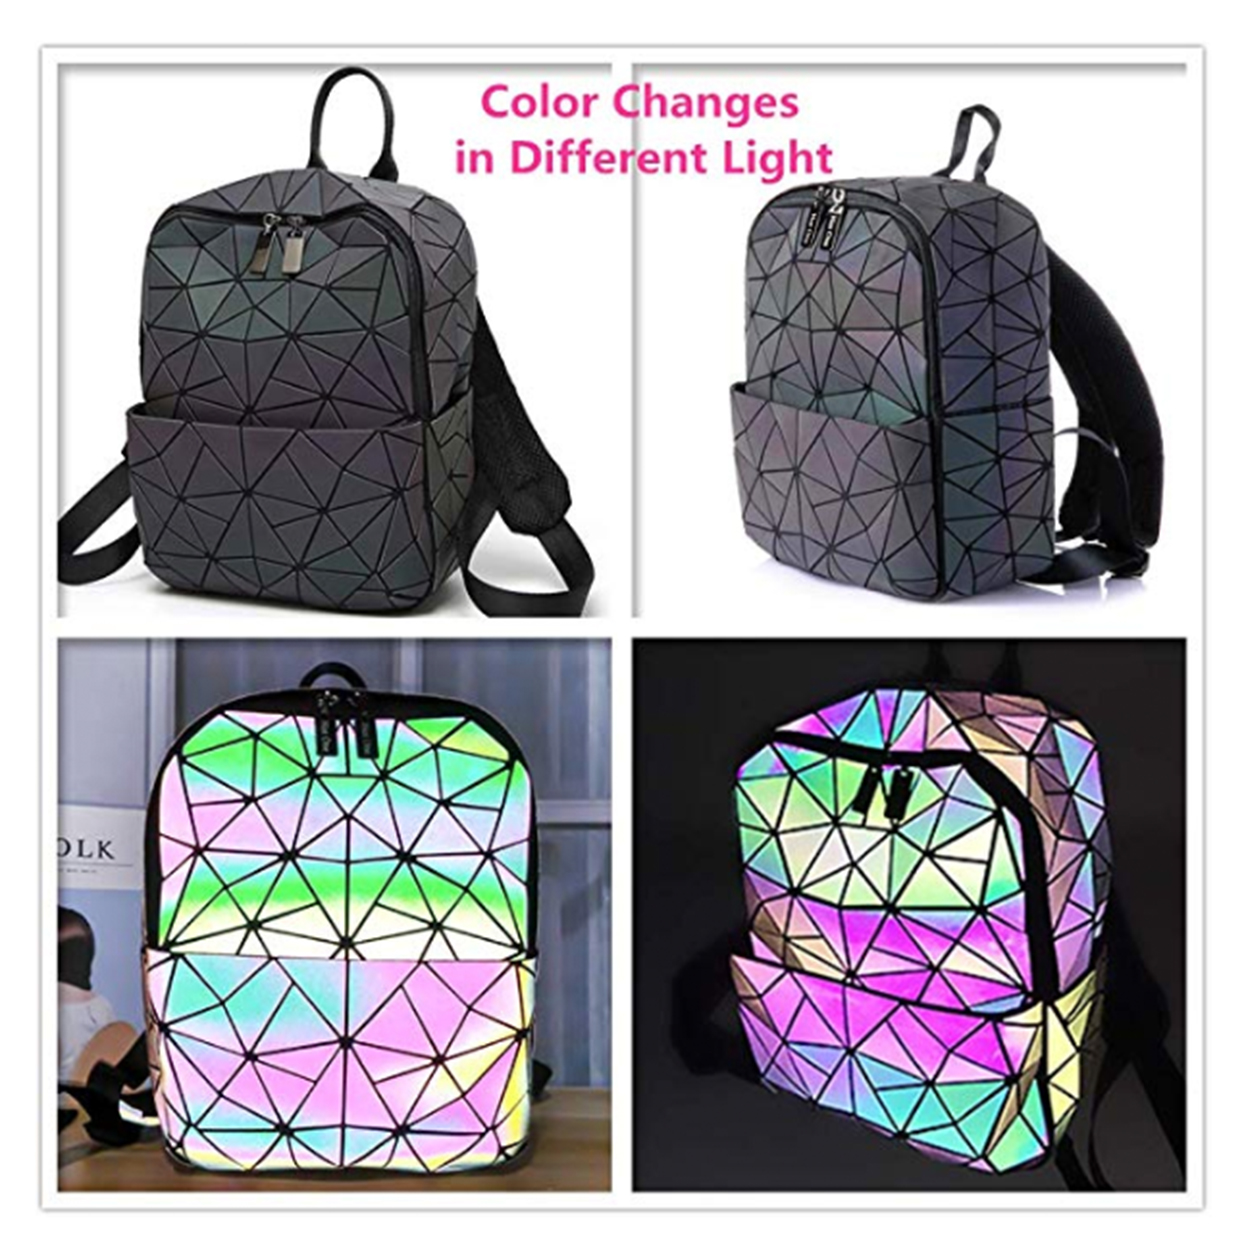 rainbow-luminous-geometric-purse-amazon-4.jpg